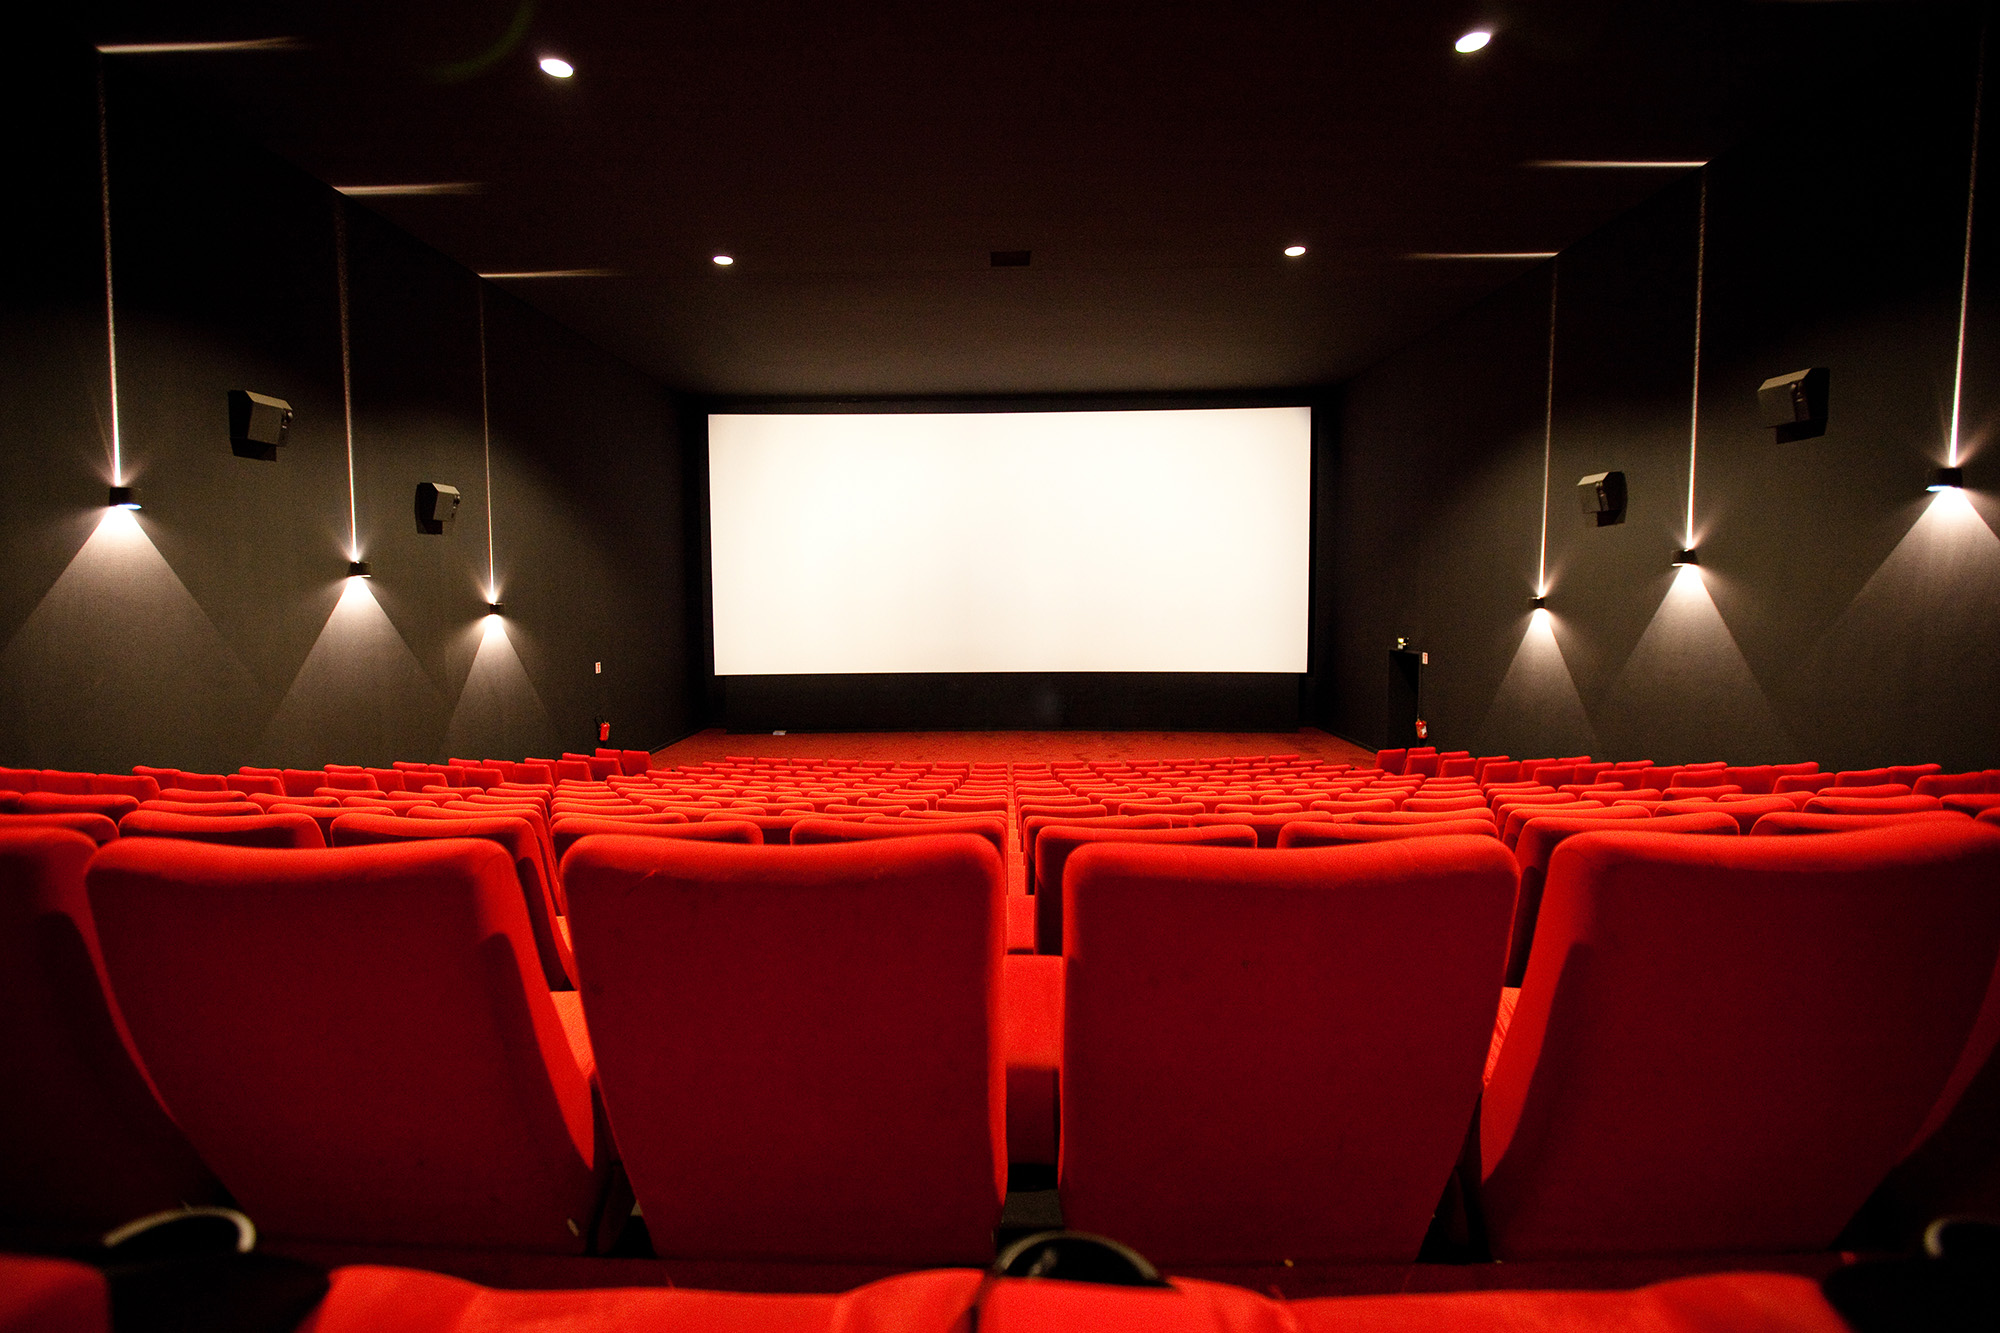 Right Movie Night